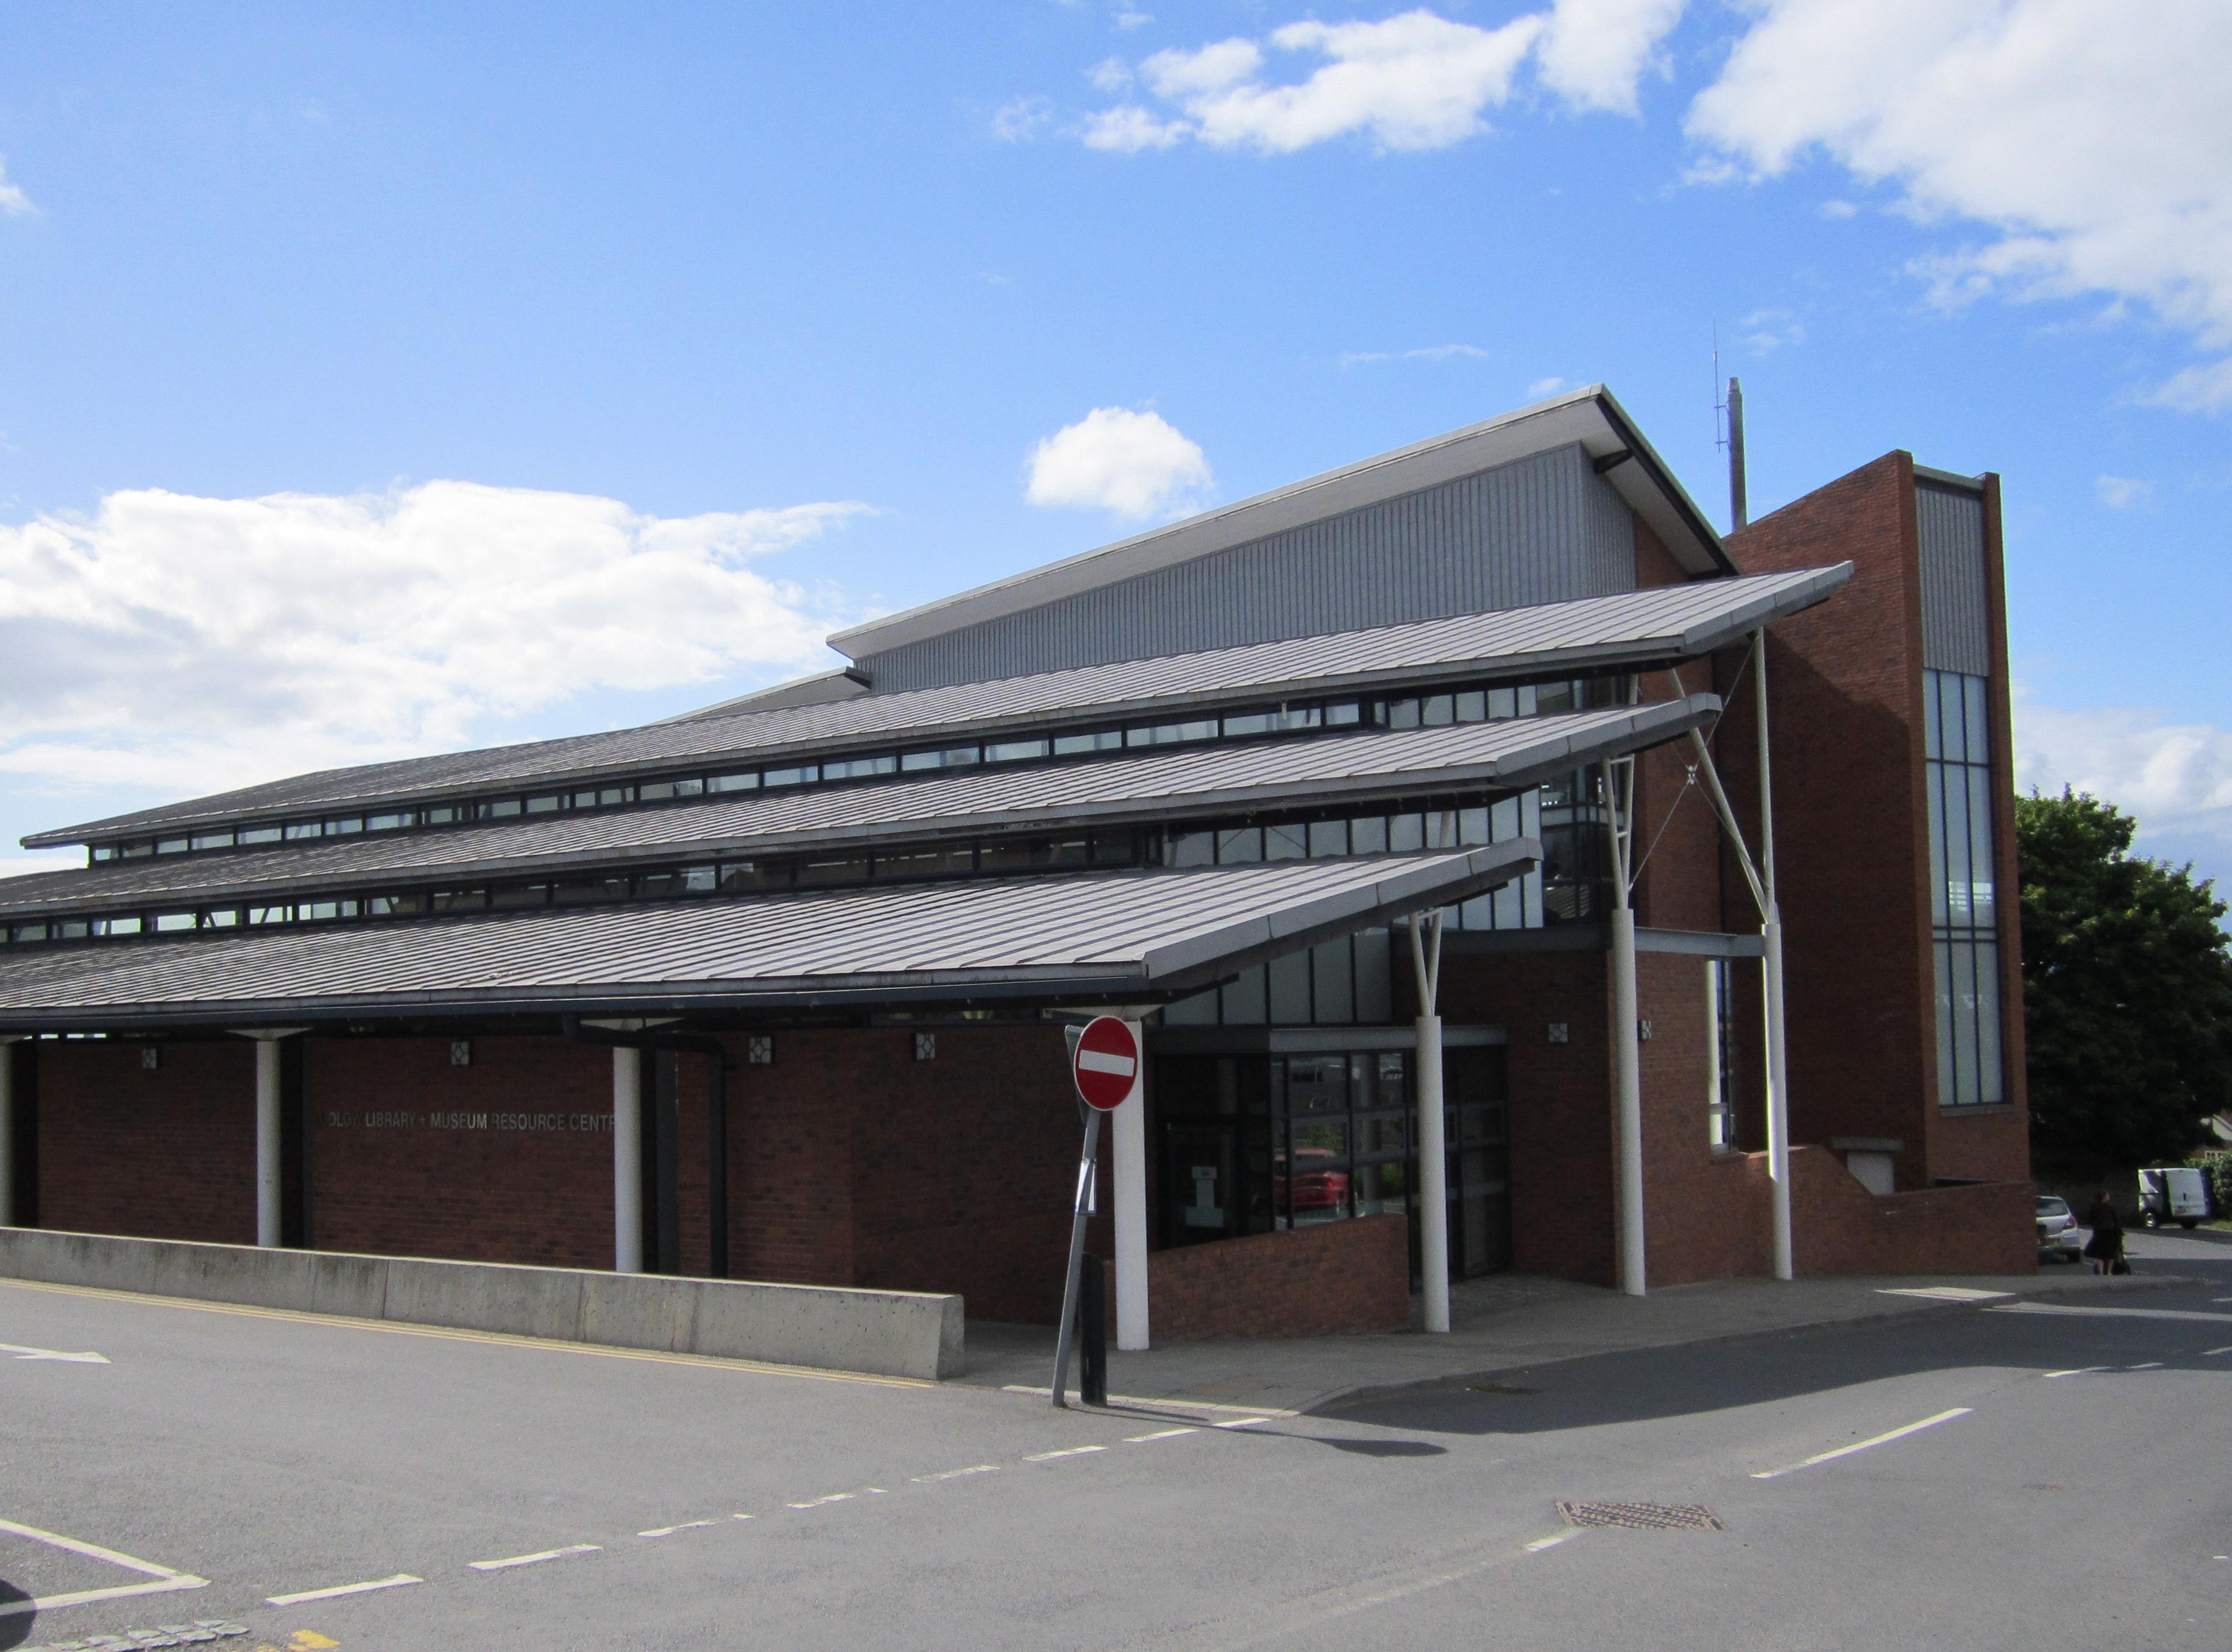 Ludlow Museum Resource Centre